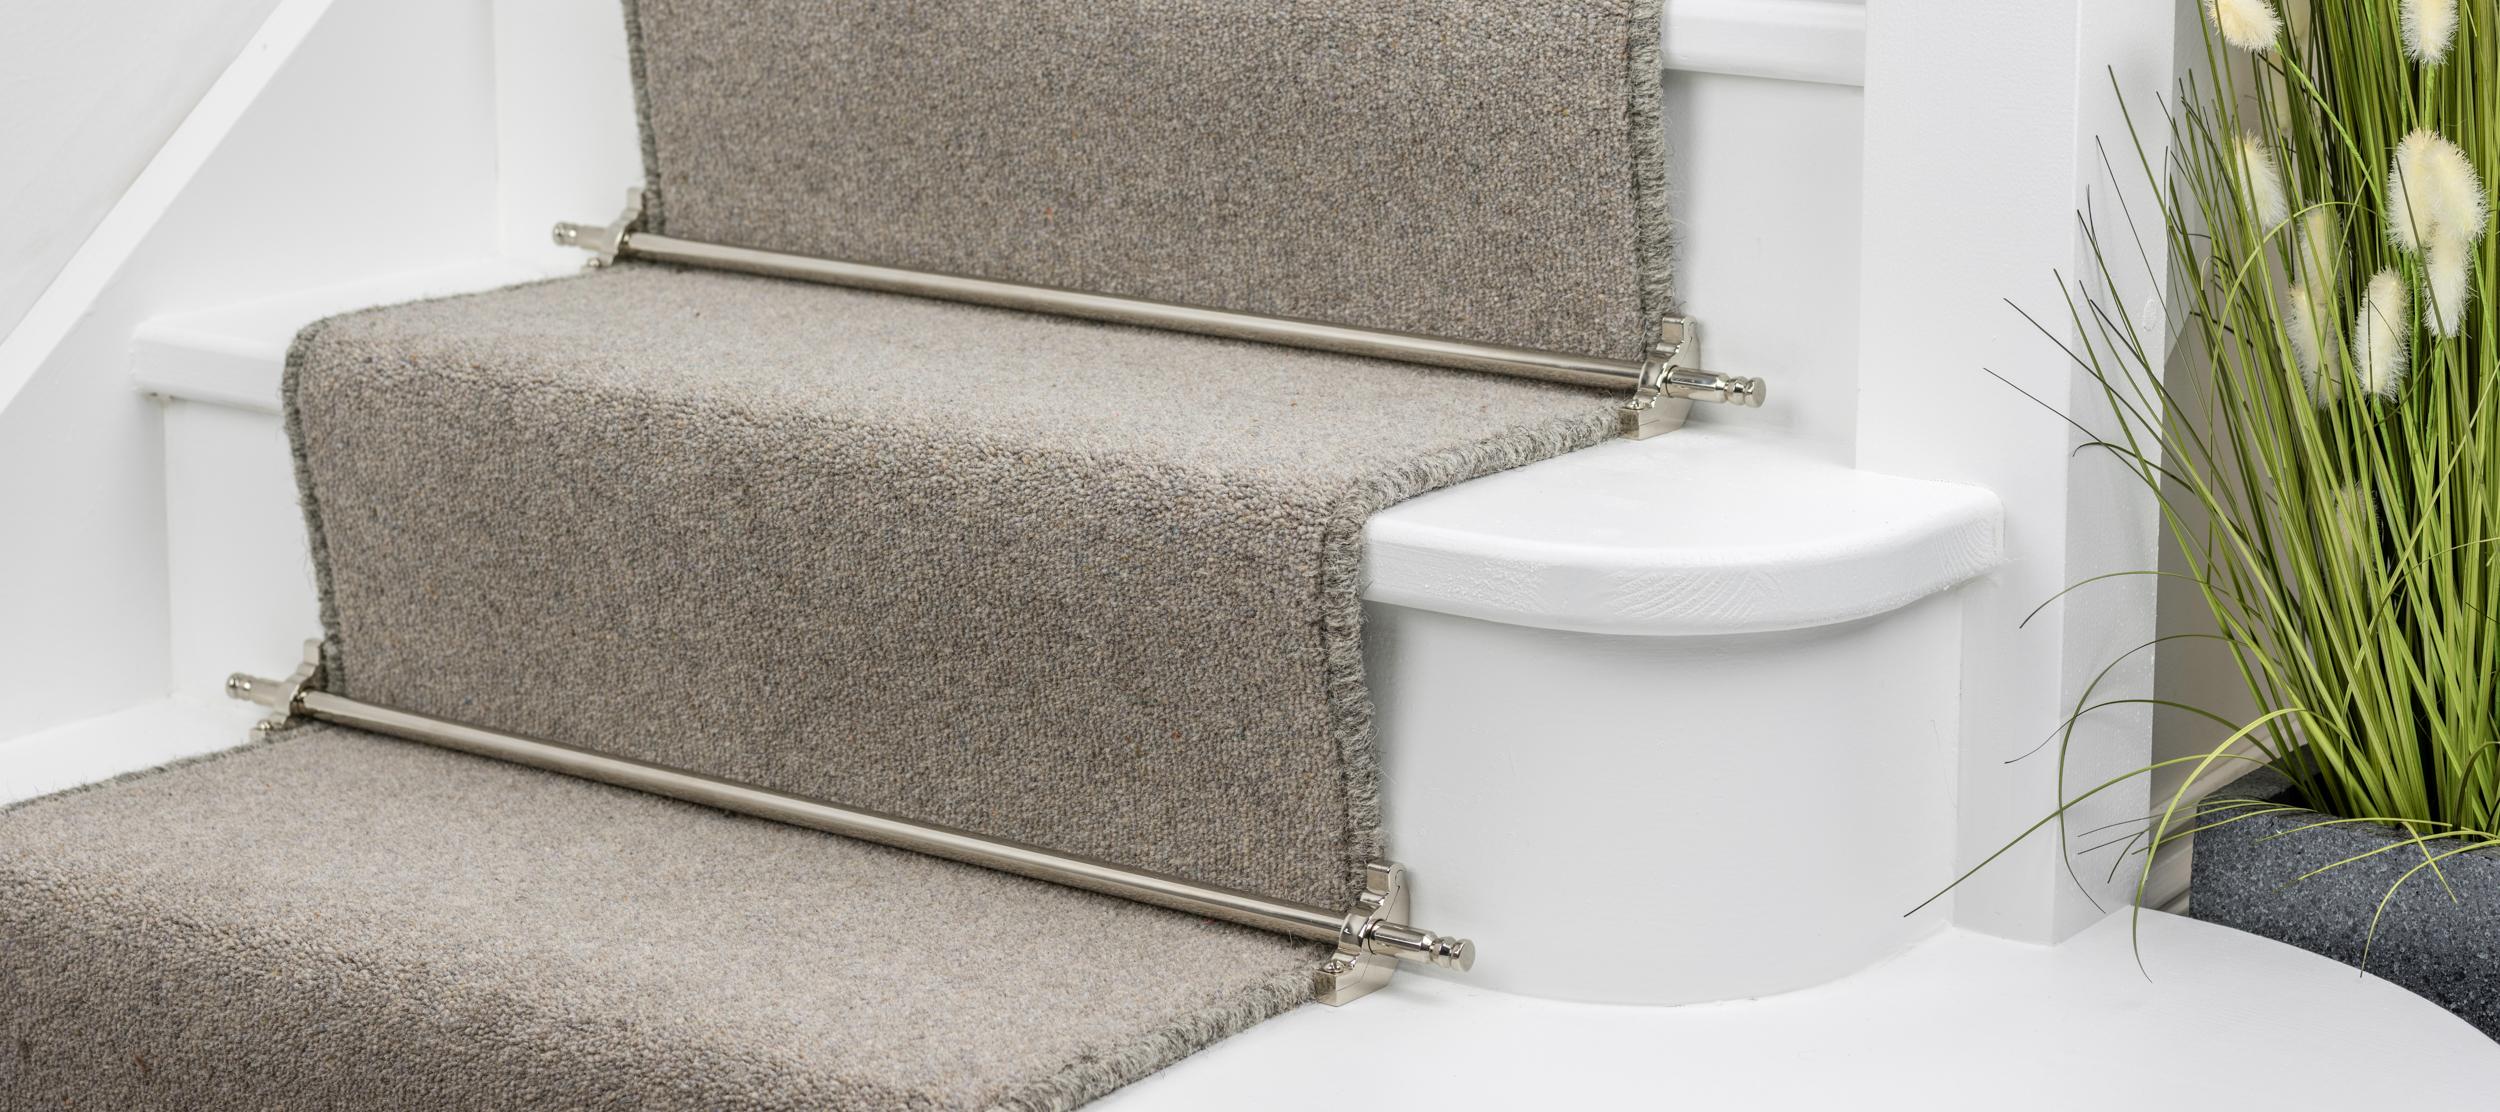 stairrods-polished-nickel-balmoral.jpg